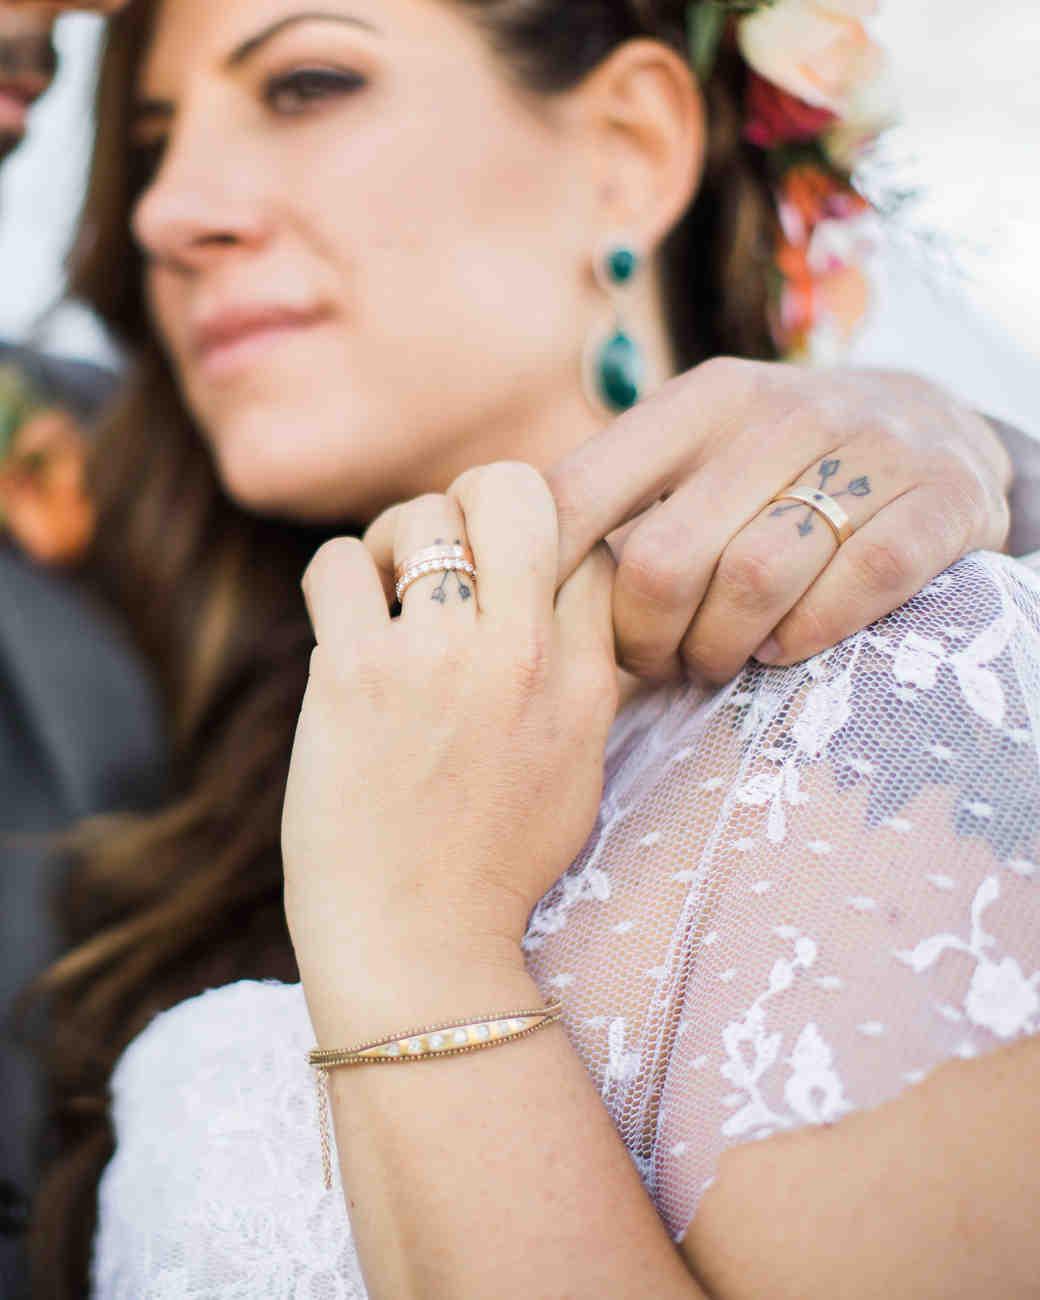 lara-chad-wedding-tattoo-505-s112306-1115.jpg